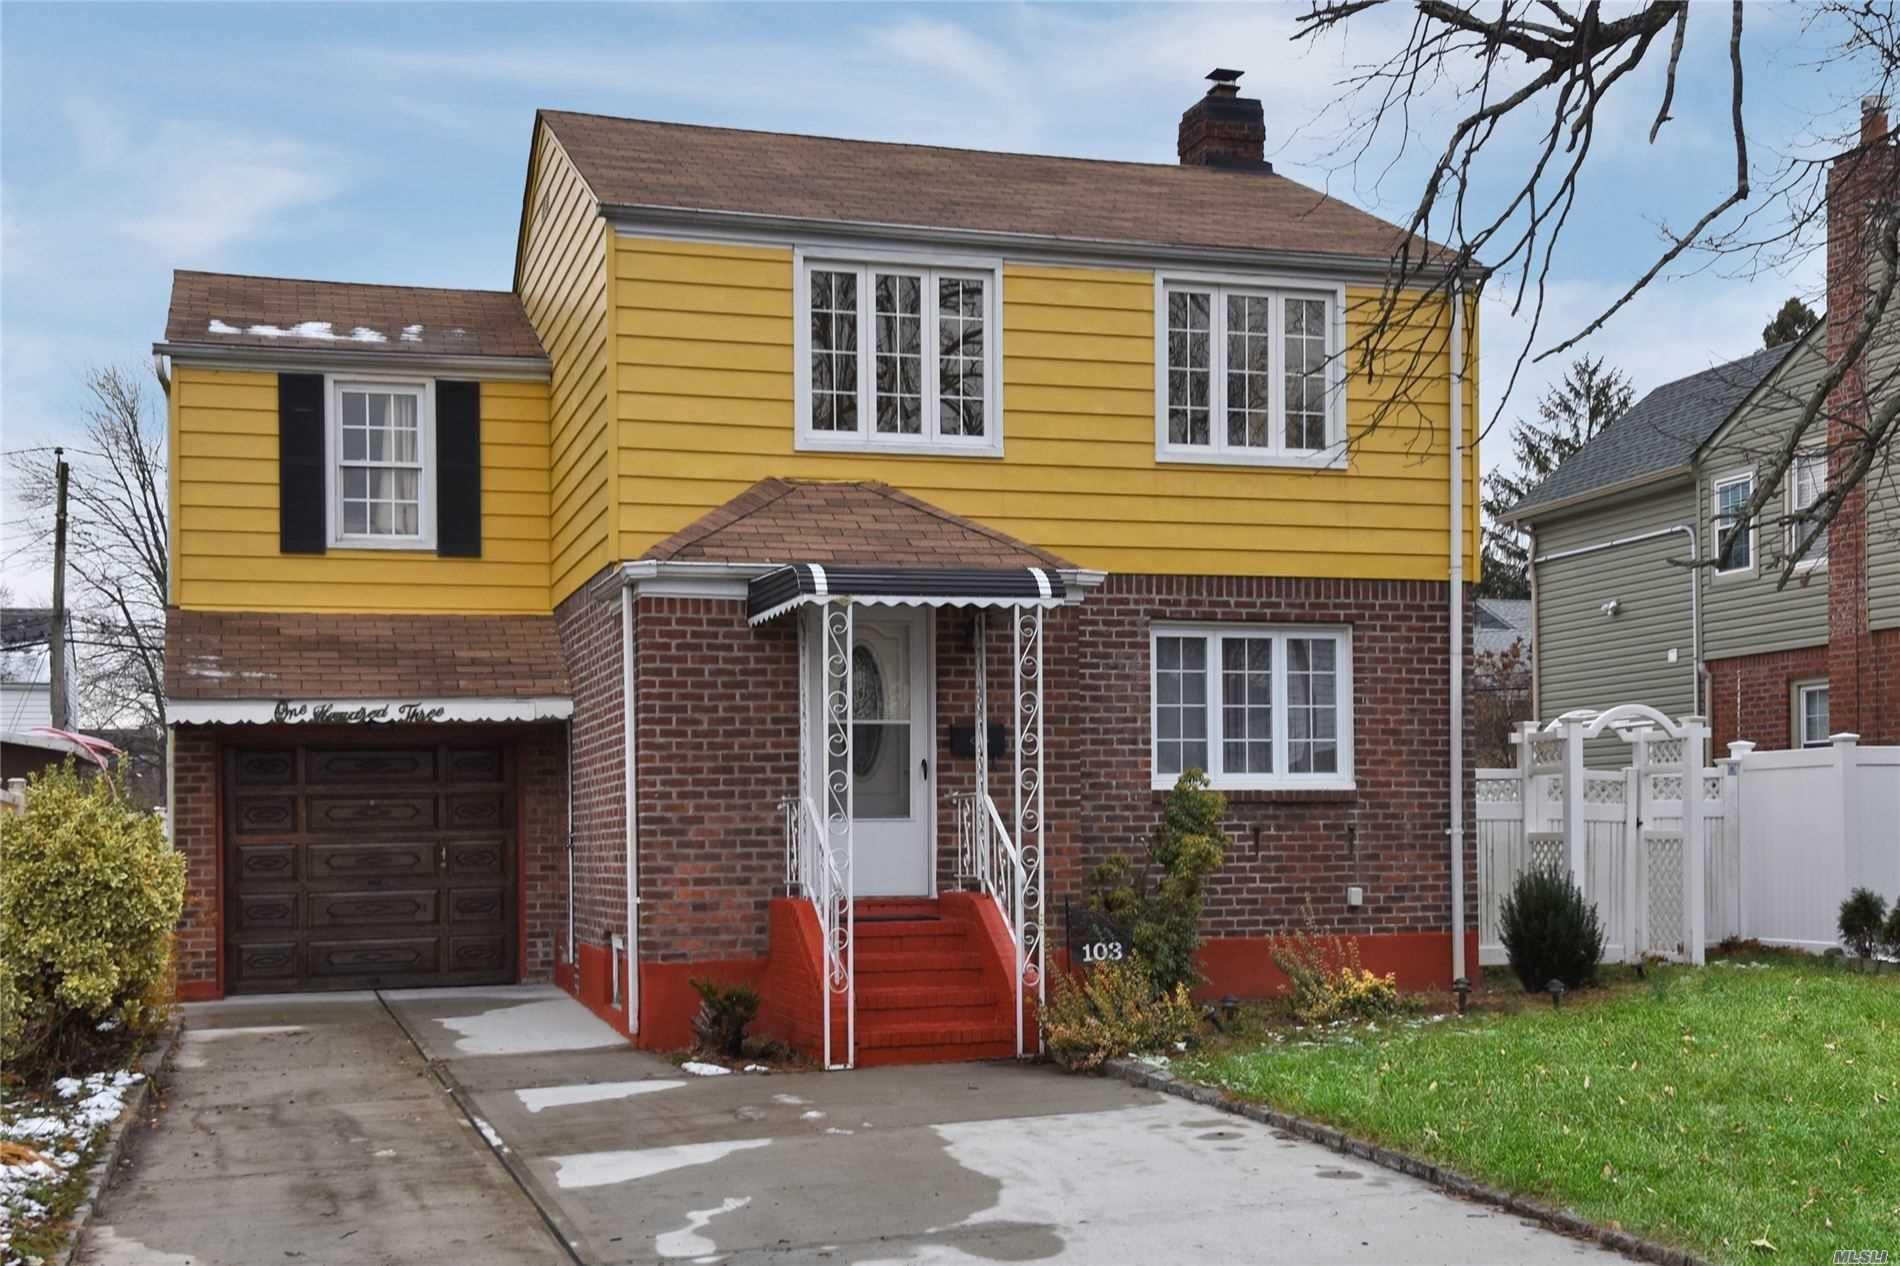 103 Silver Street, Elmont, NY 11003 - MLS#: 3184515